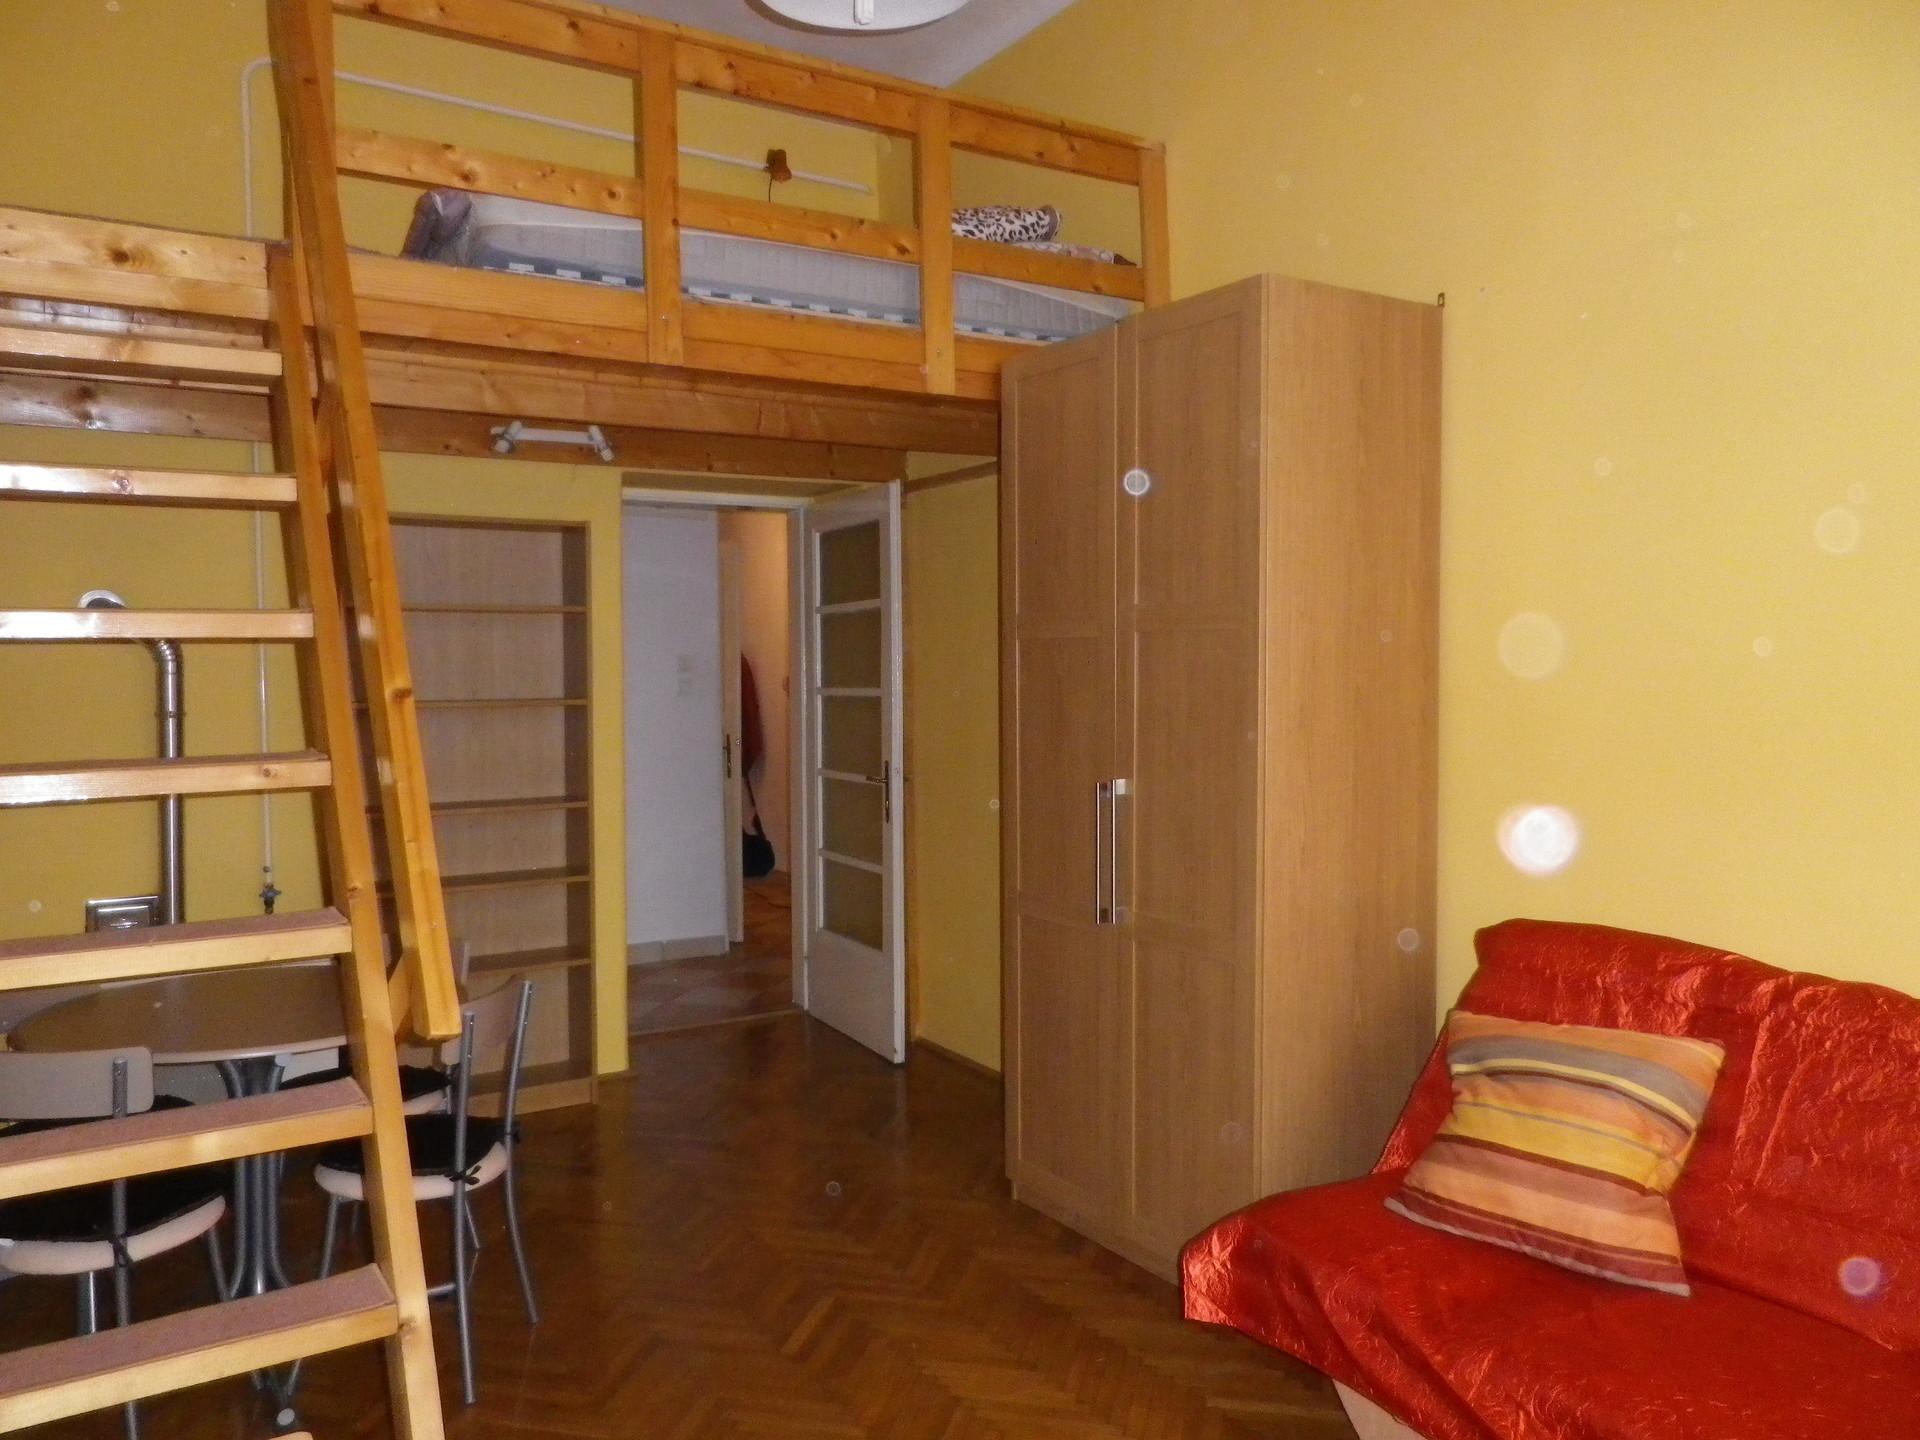 cozy-apartment-center-budapest-f36d05220478b5d3acad85b3c2faf4eb